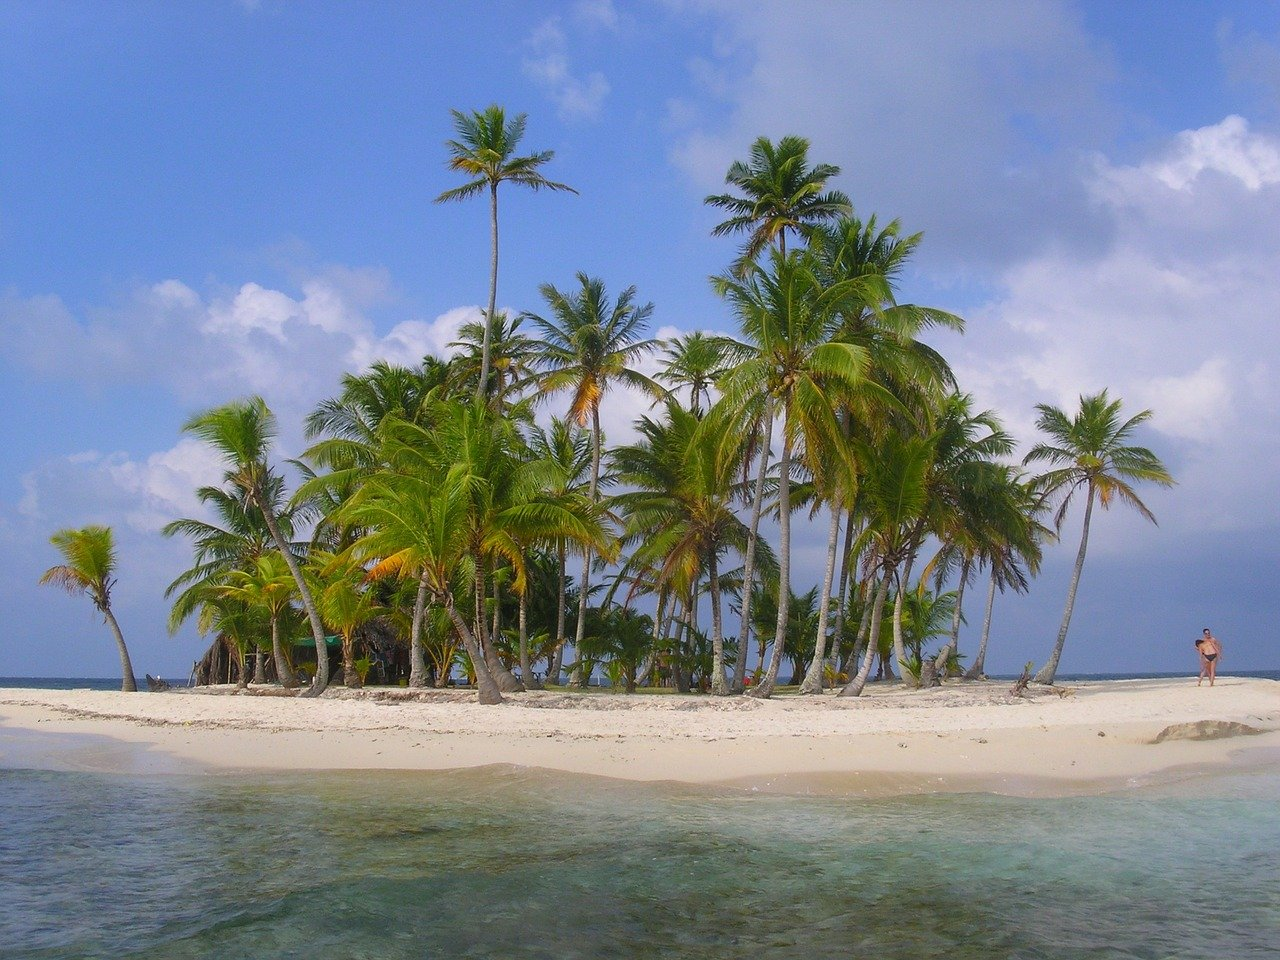 San Blas Islands – A Piece of Heaven 6